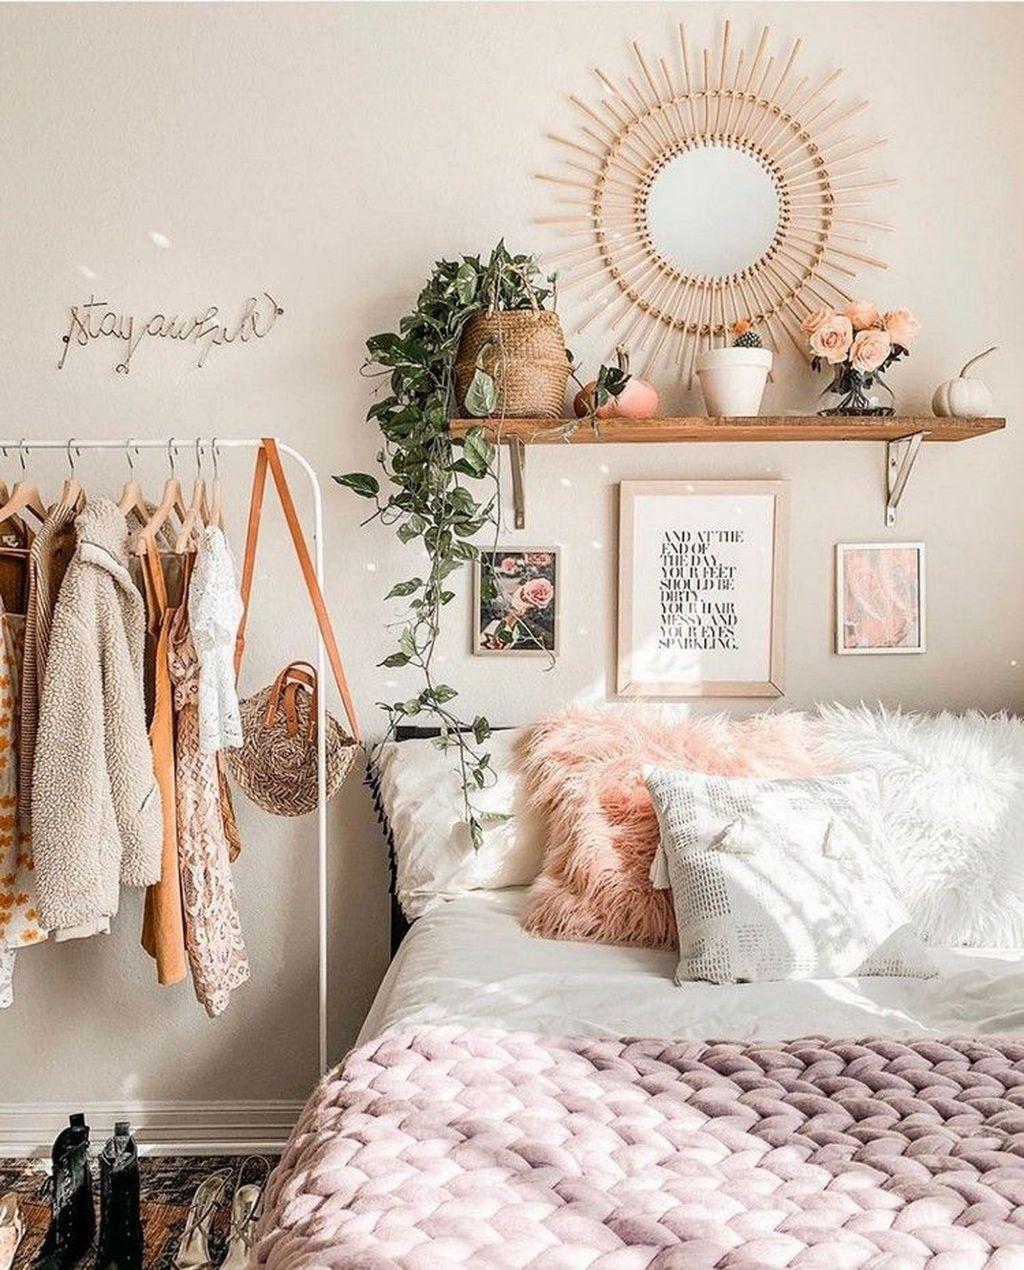 Awesome Boho Chic Bedroom Decor Ideas 28